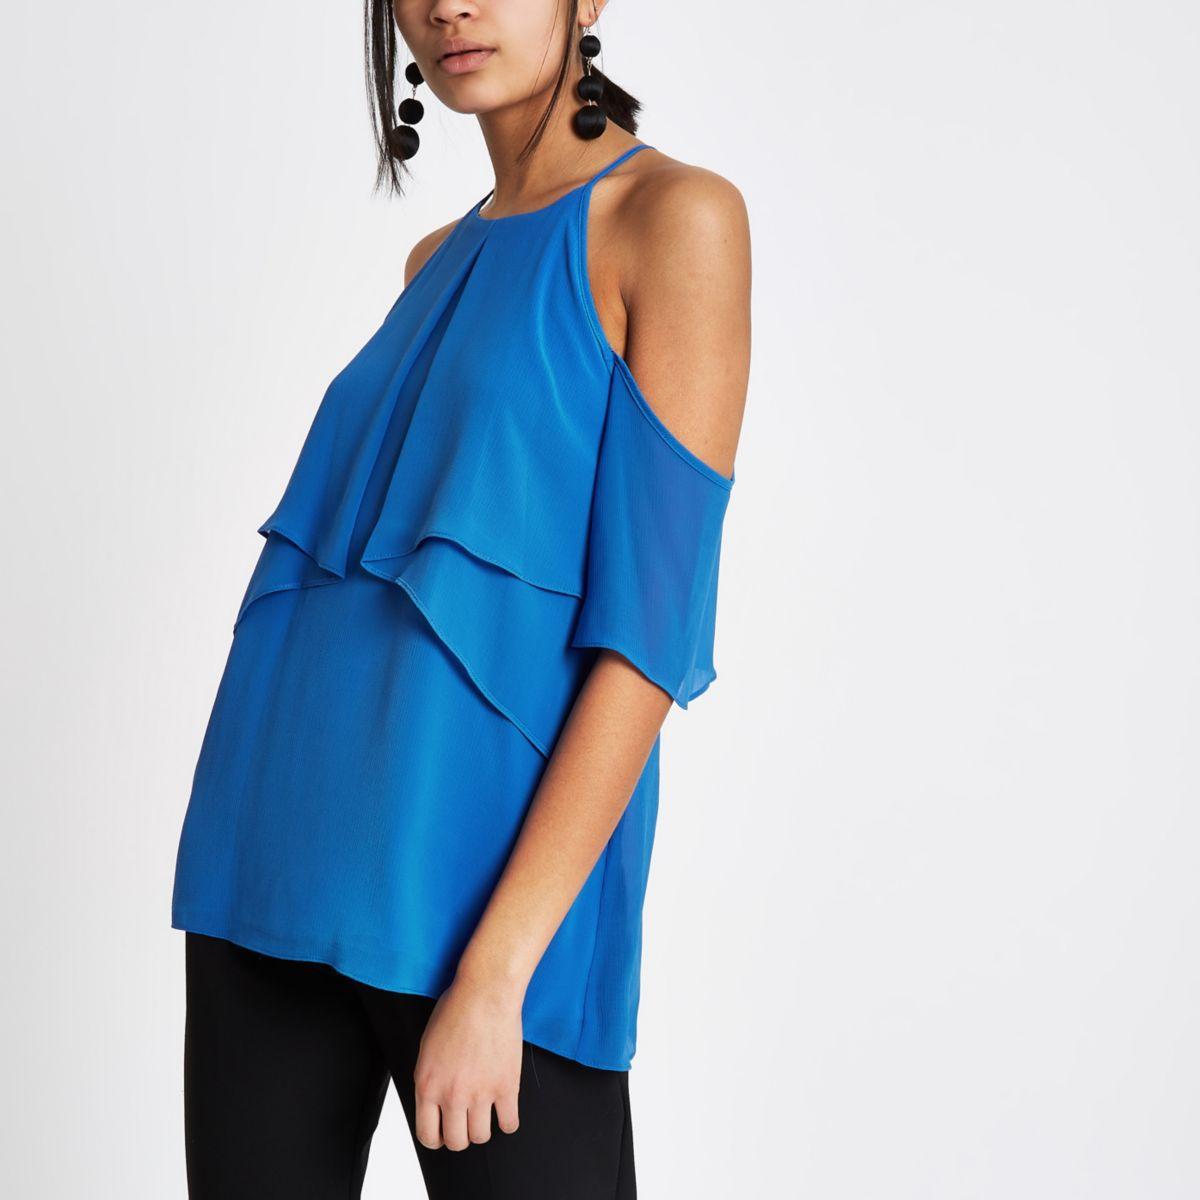 Donkerblauwe crêpe schouderloze blouse met ruches